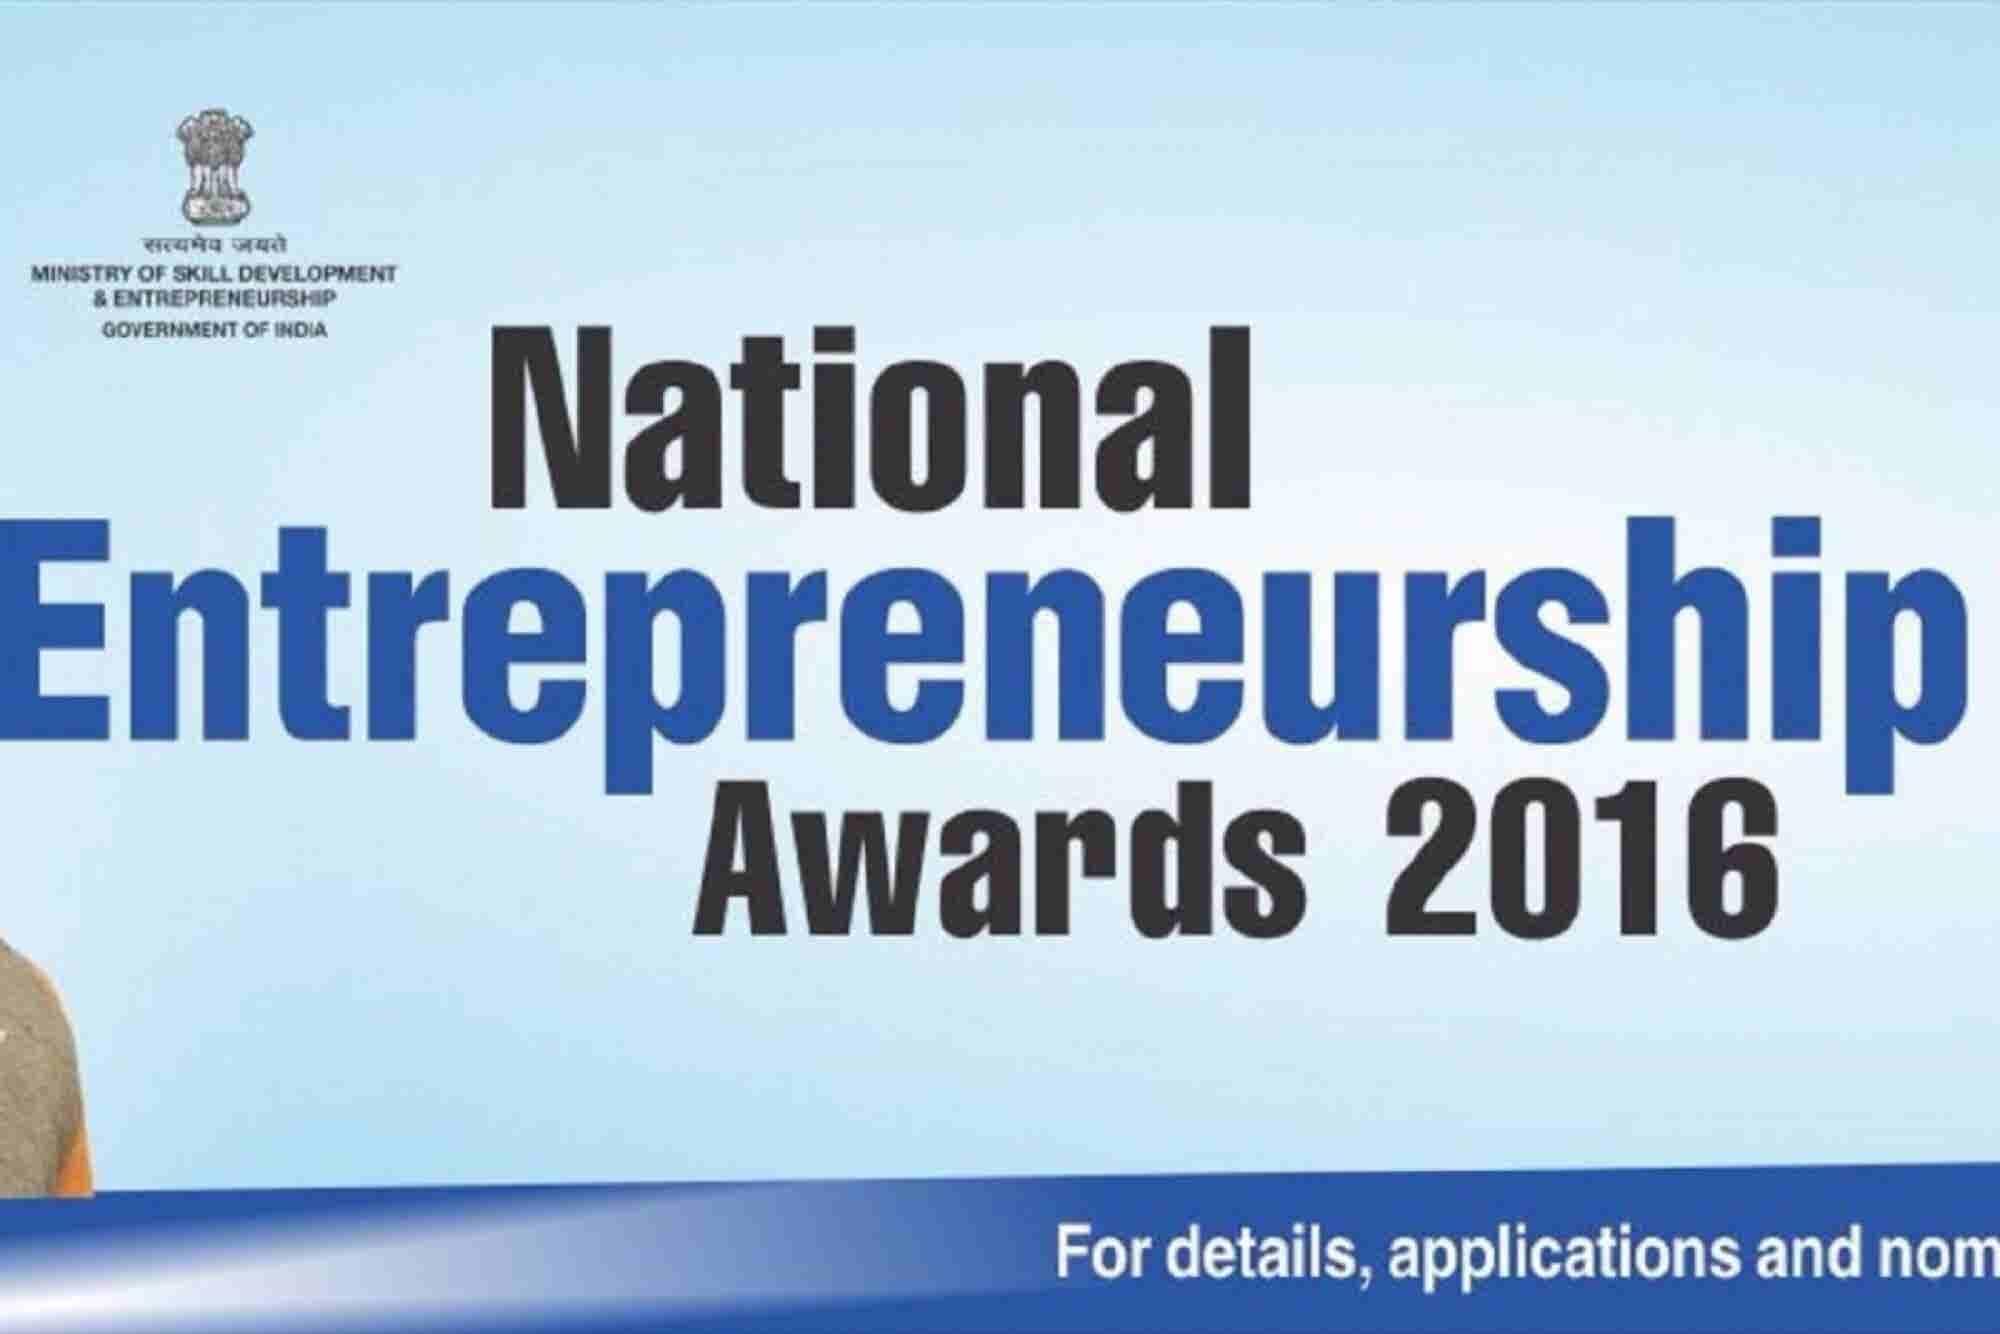 National Entrepreneurship Awards 2016 to Encourage Entrepreneurial Culture in India